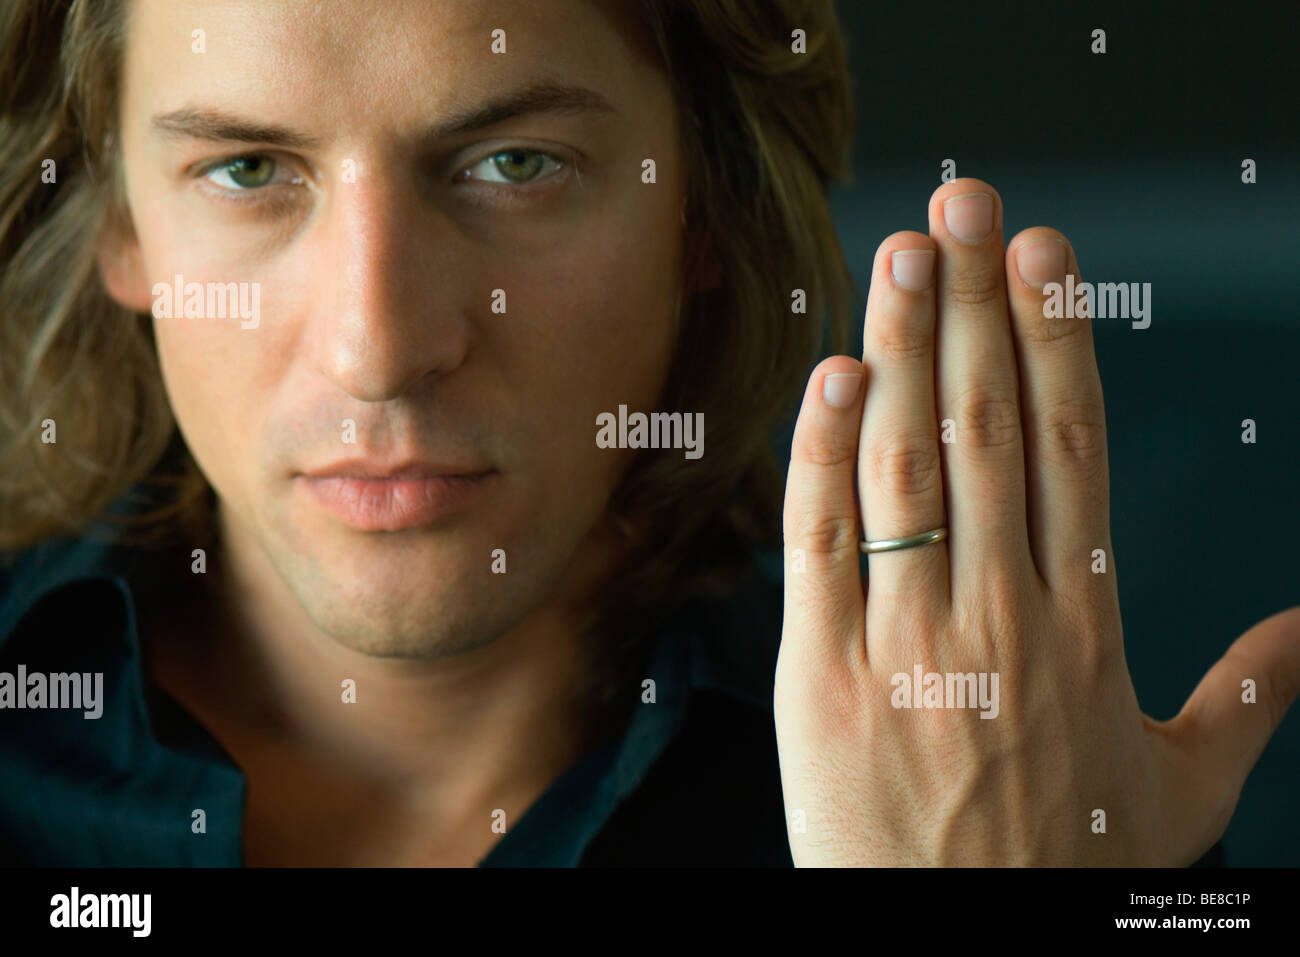 Man Holding Up Hand Showing Wedding Ring Stock Photo 26000626 Alamy